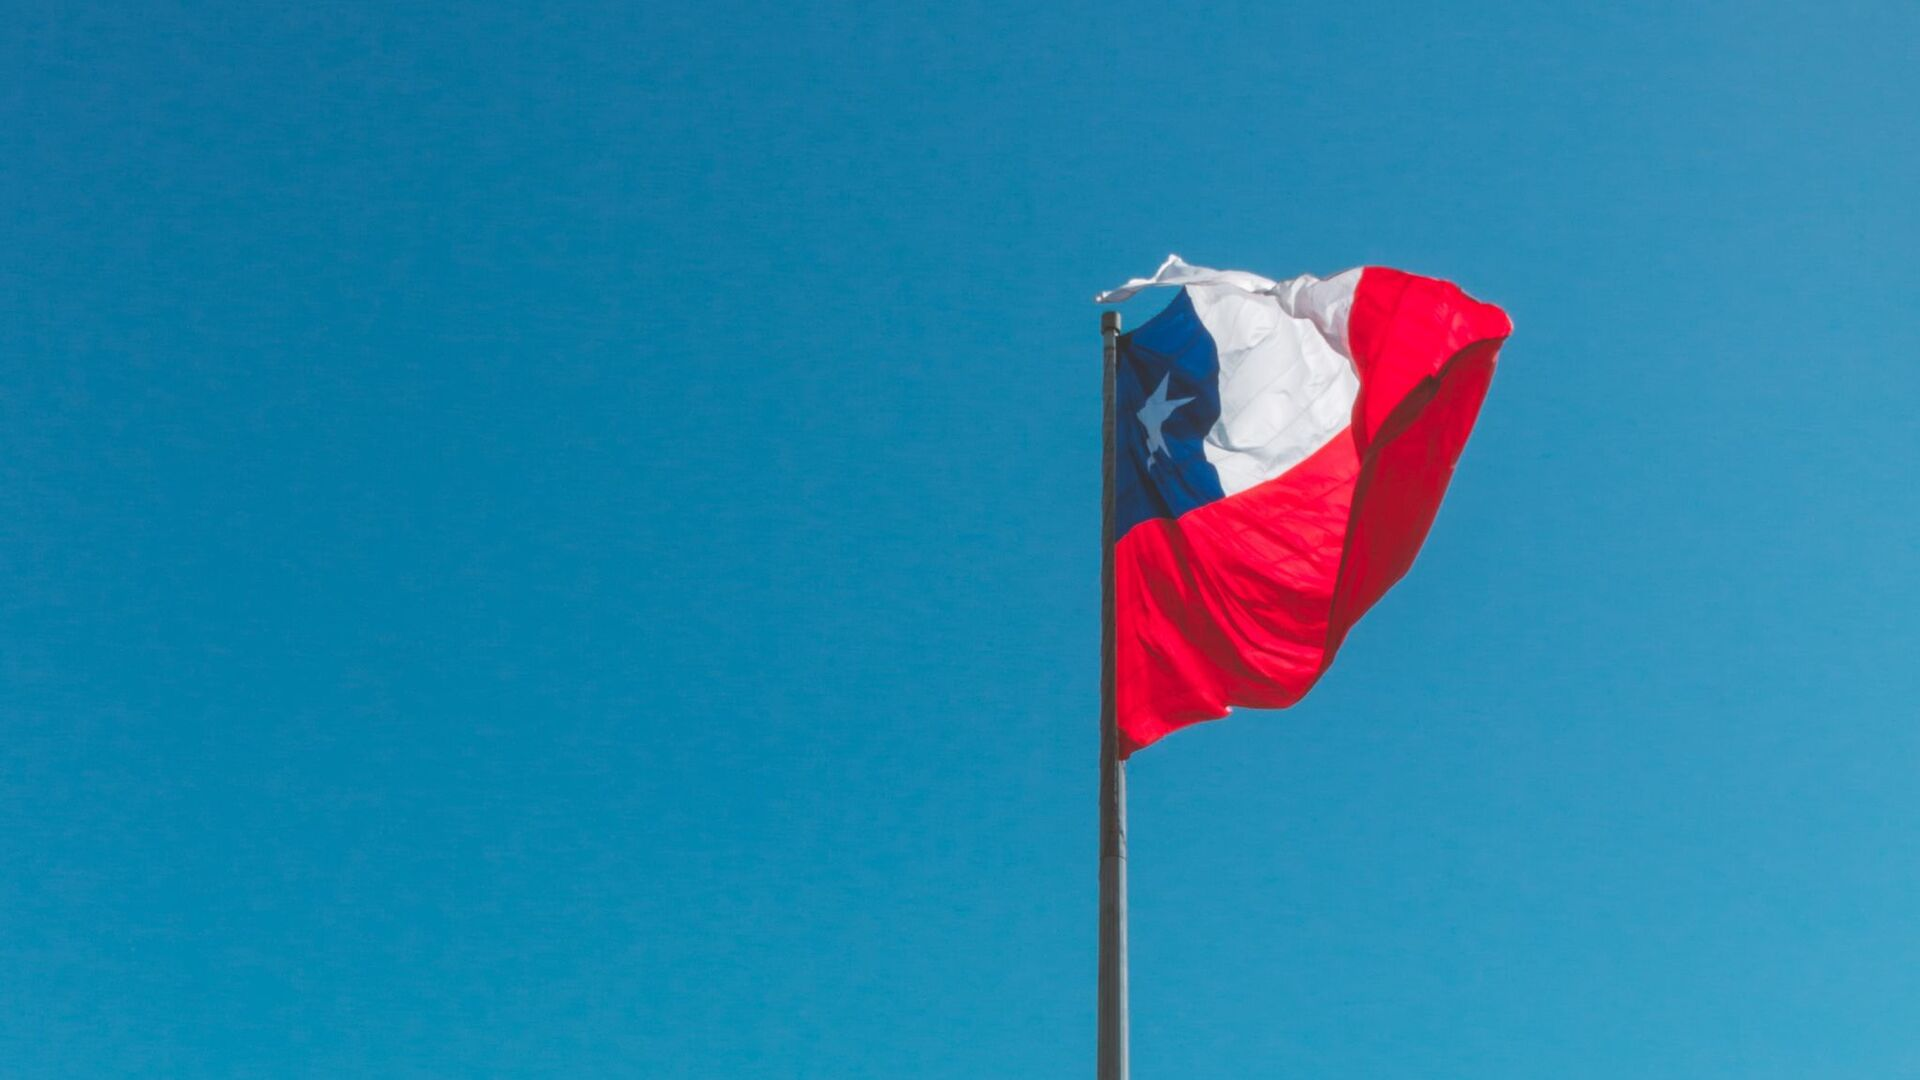 La bandera de Chile - Sputnik Mundo, 1920, 03.03.2021